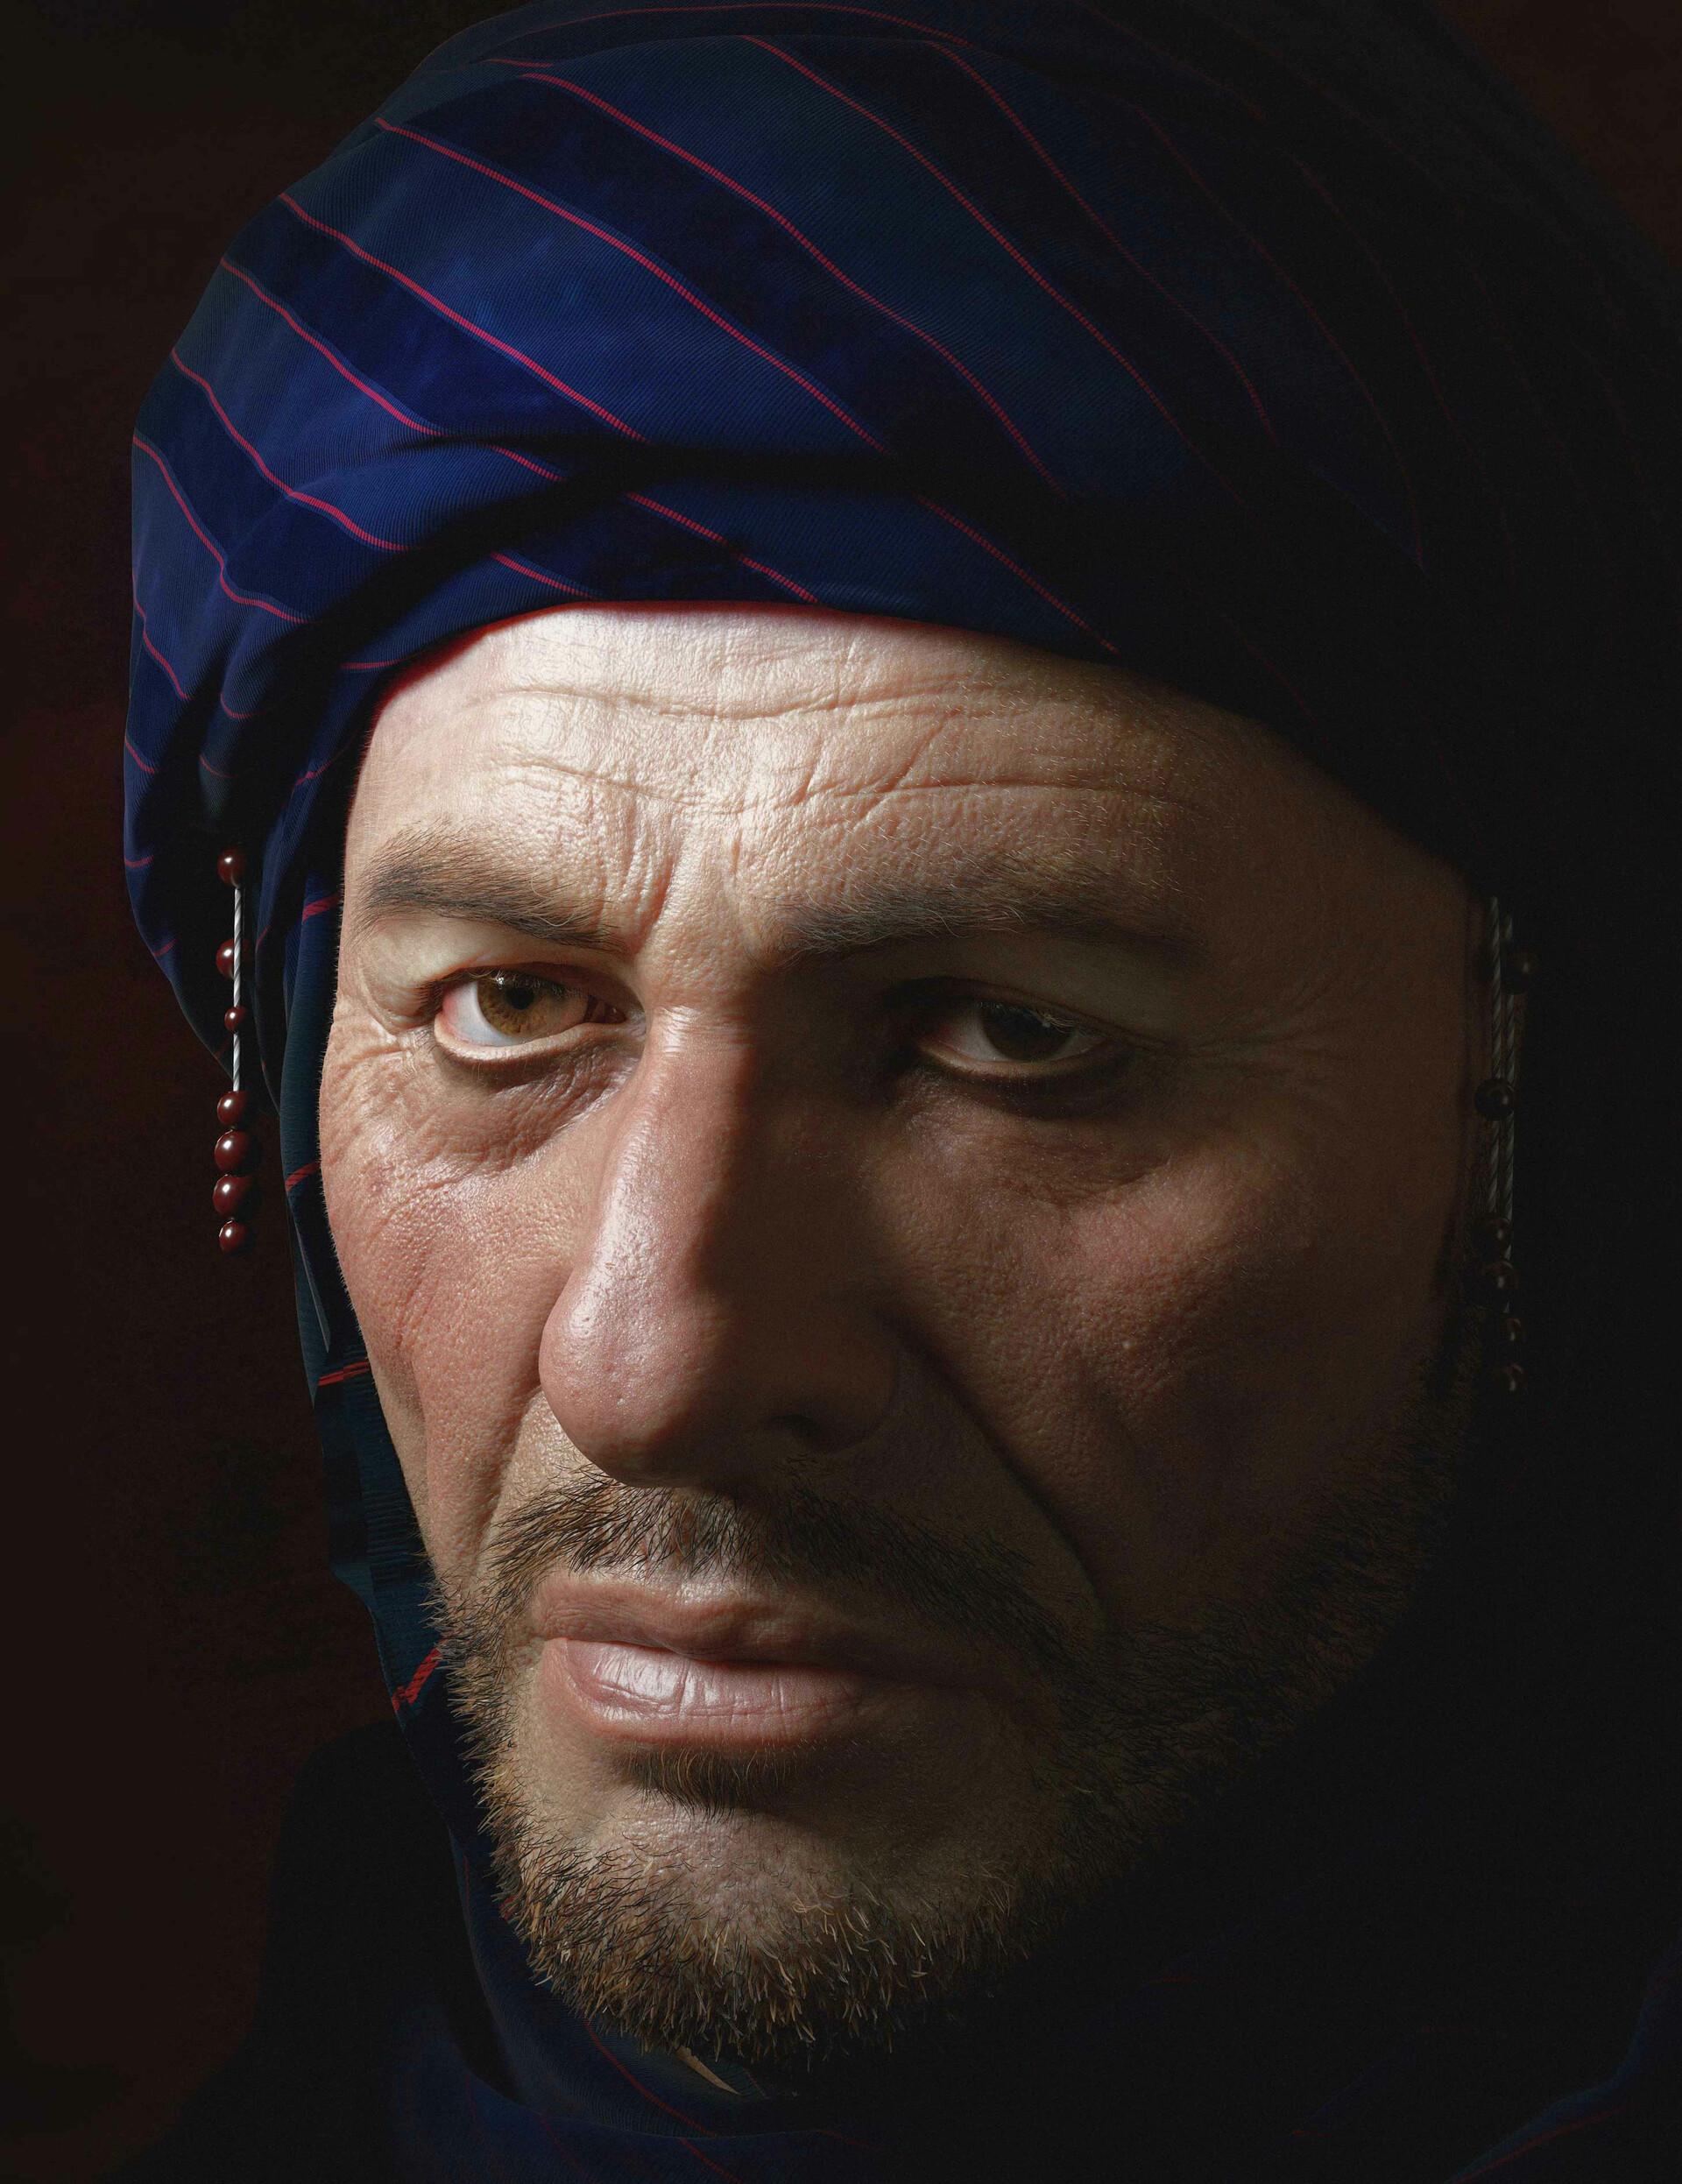 [Image: ahmed-afazil-preview03.jpg?1563469624]